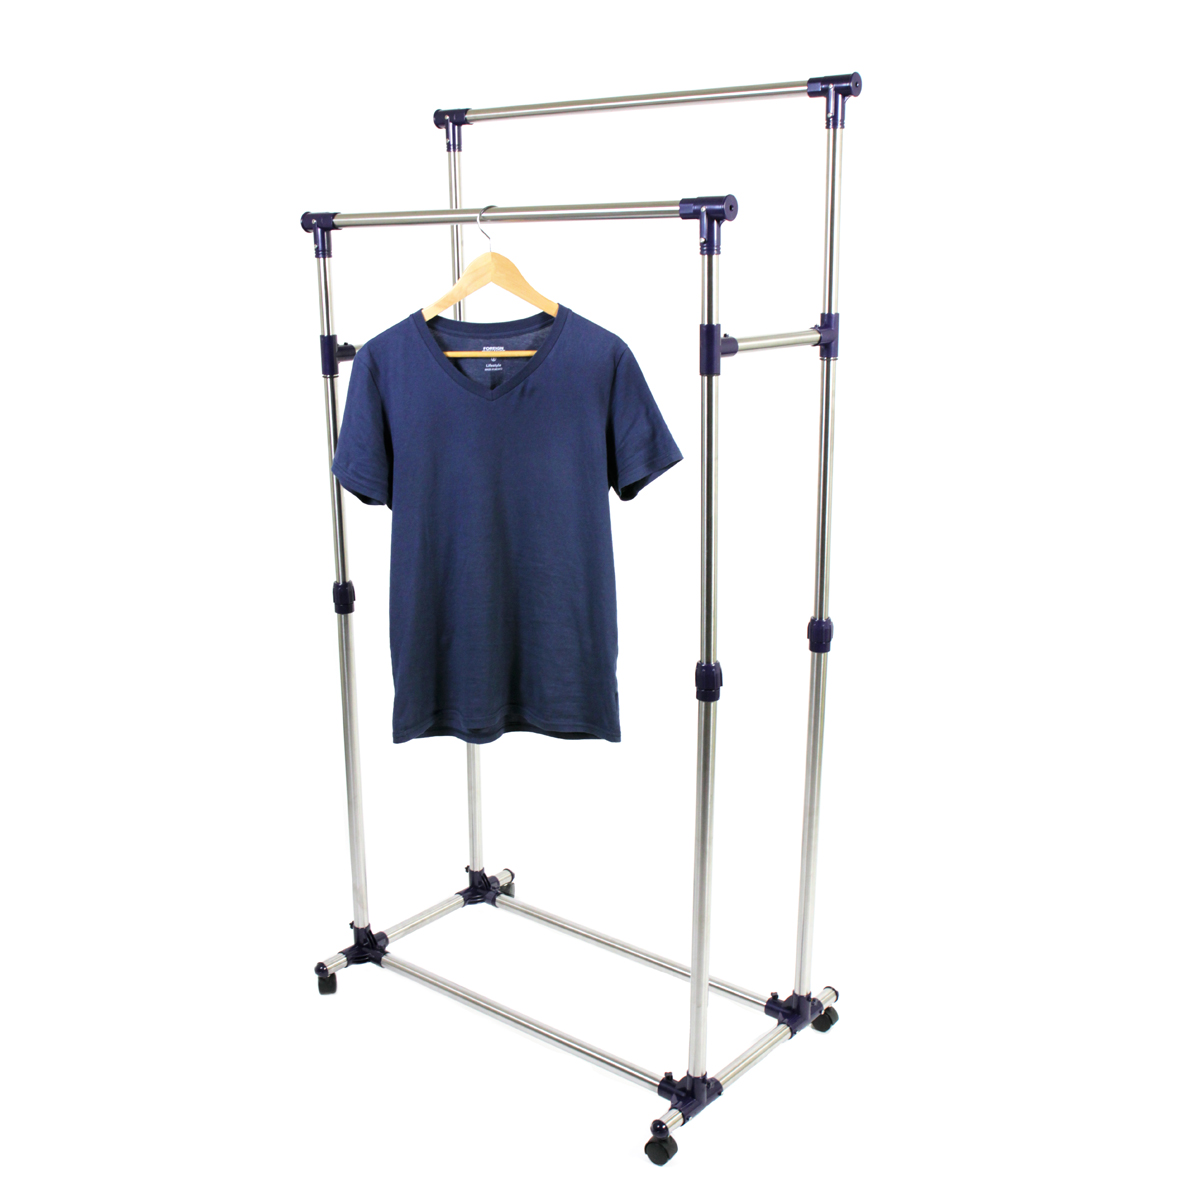 new heavy duty double rail adjustable telescopic rolling clothing garment rack ebay. Black Bedroom Furniture Sets. Home Design Ideas